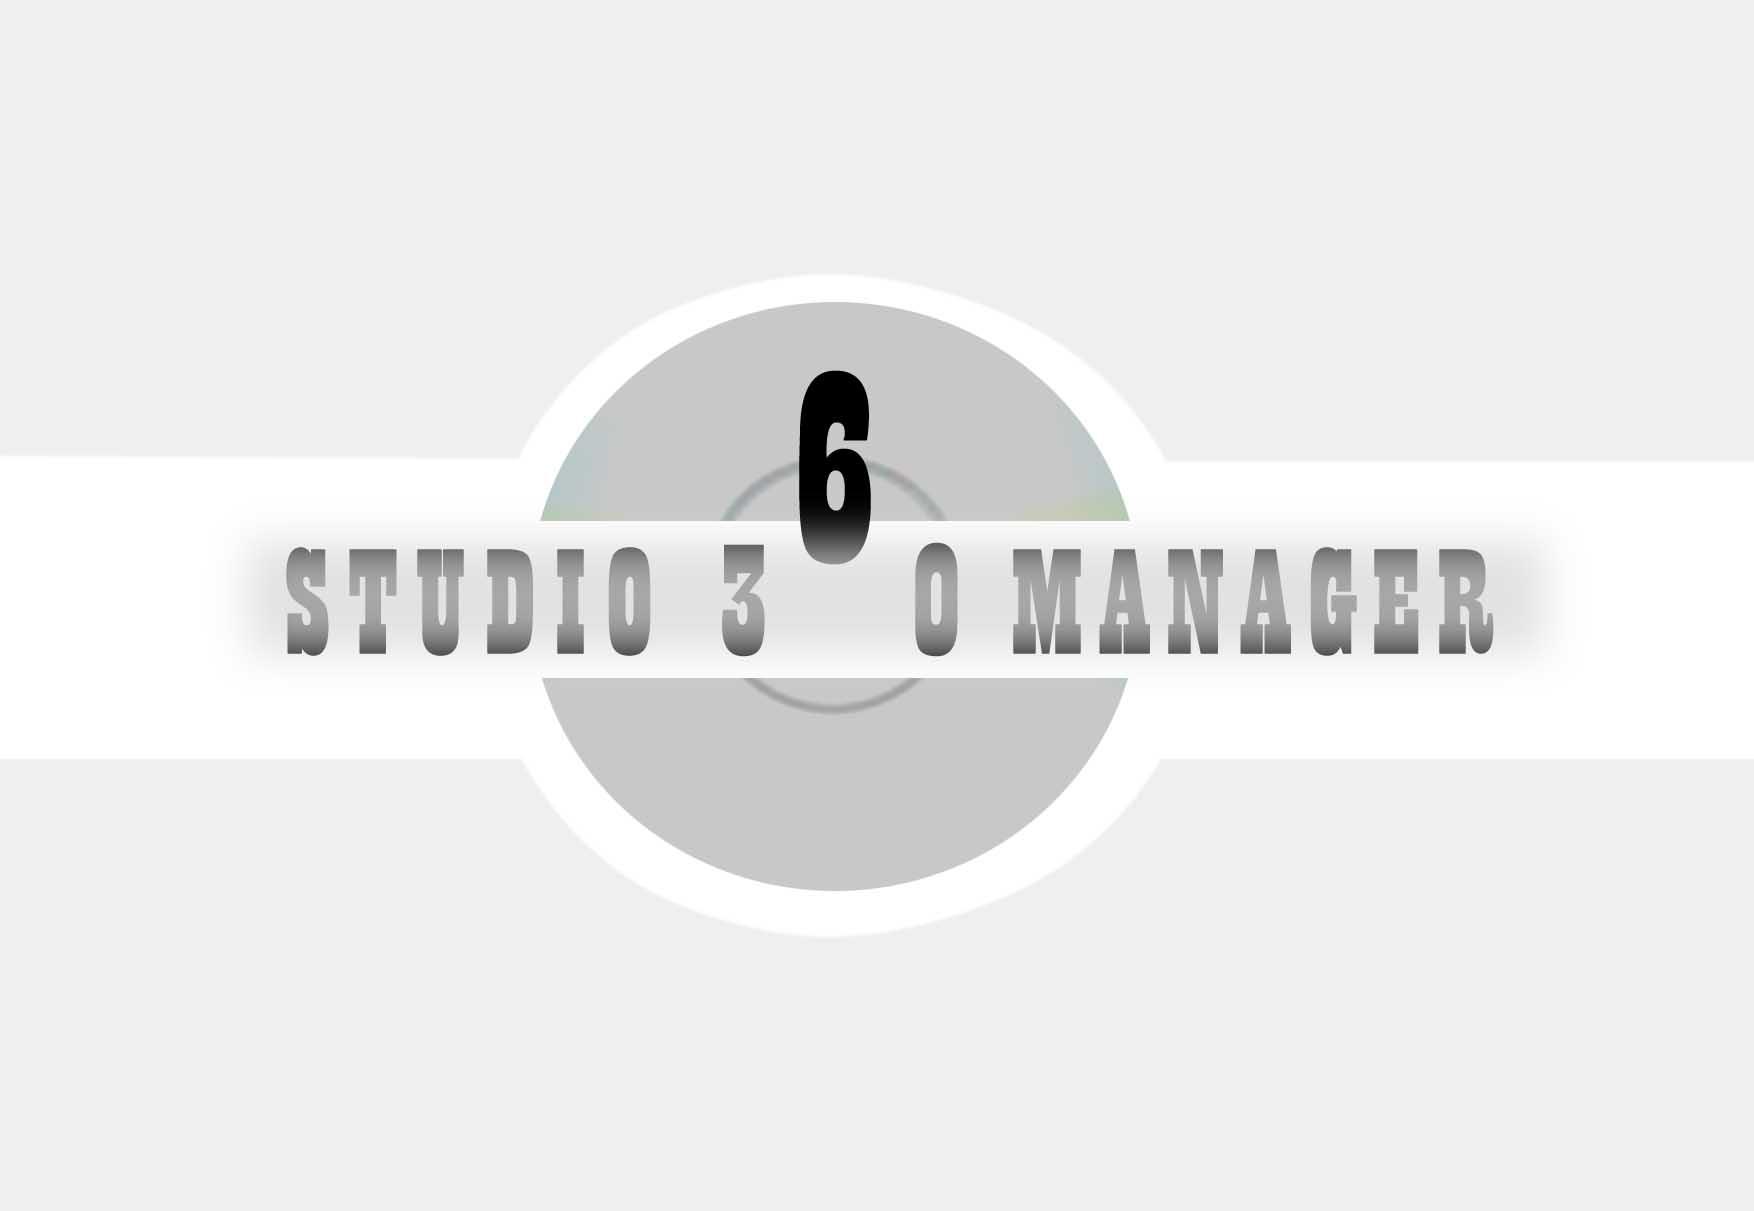 Logo Design by faza-bejo - Entry No. 122 in the Logo Design Contest Unique Logo Design Wanted for Studio Manager 360.